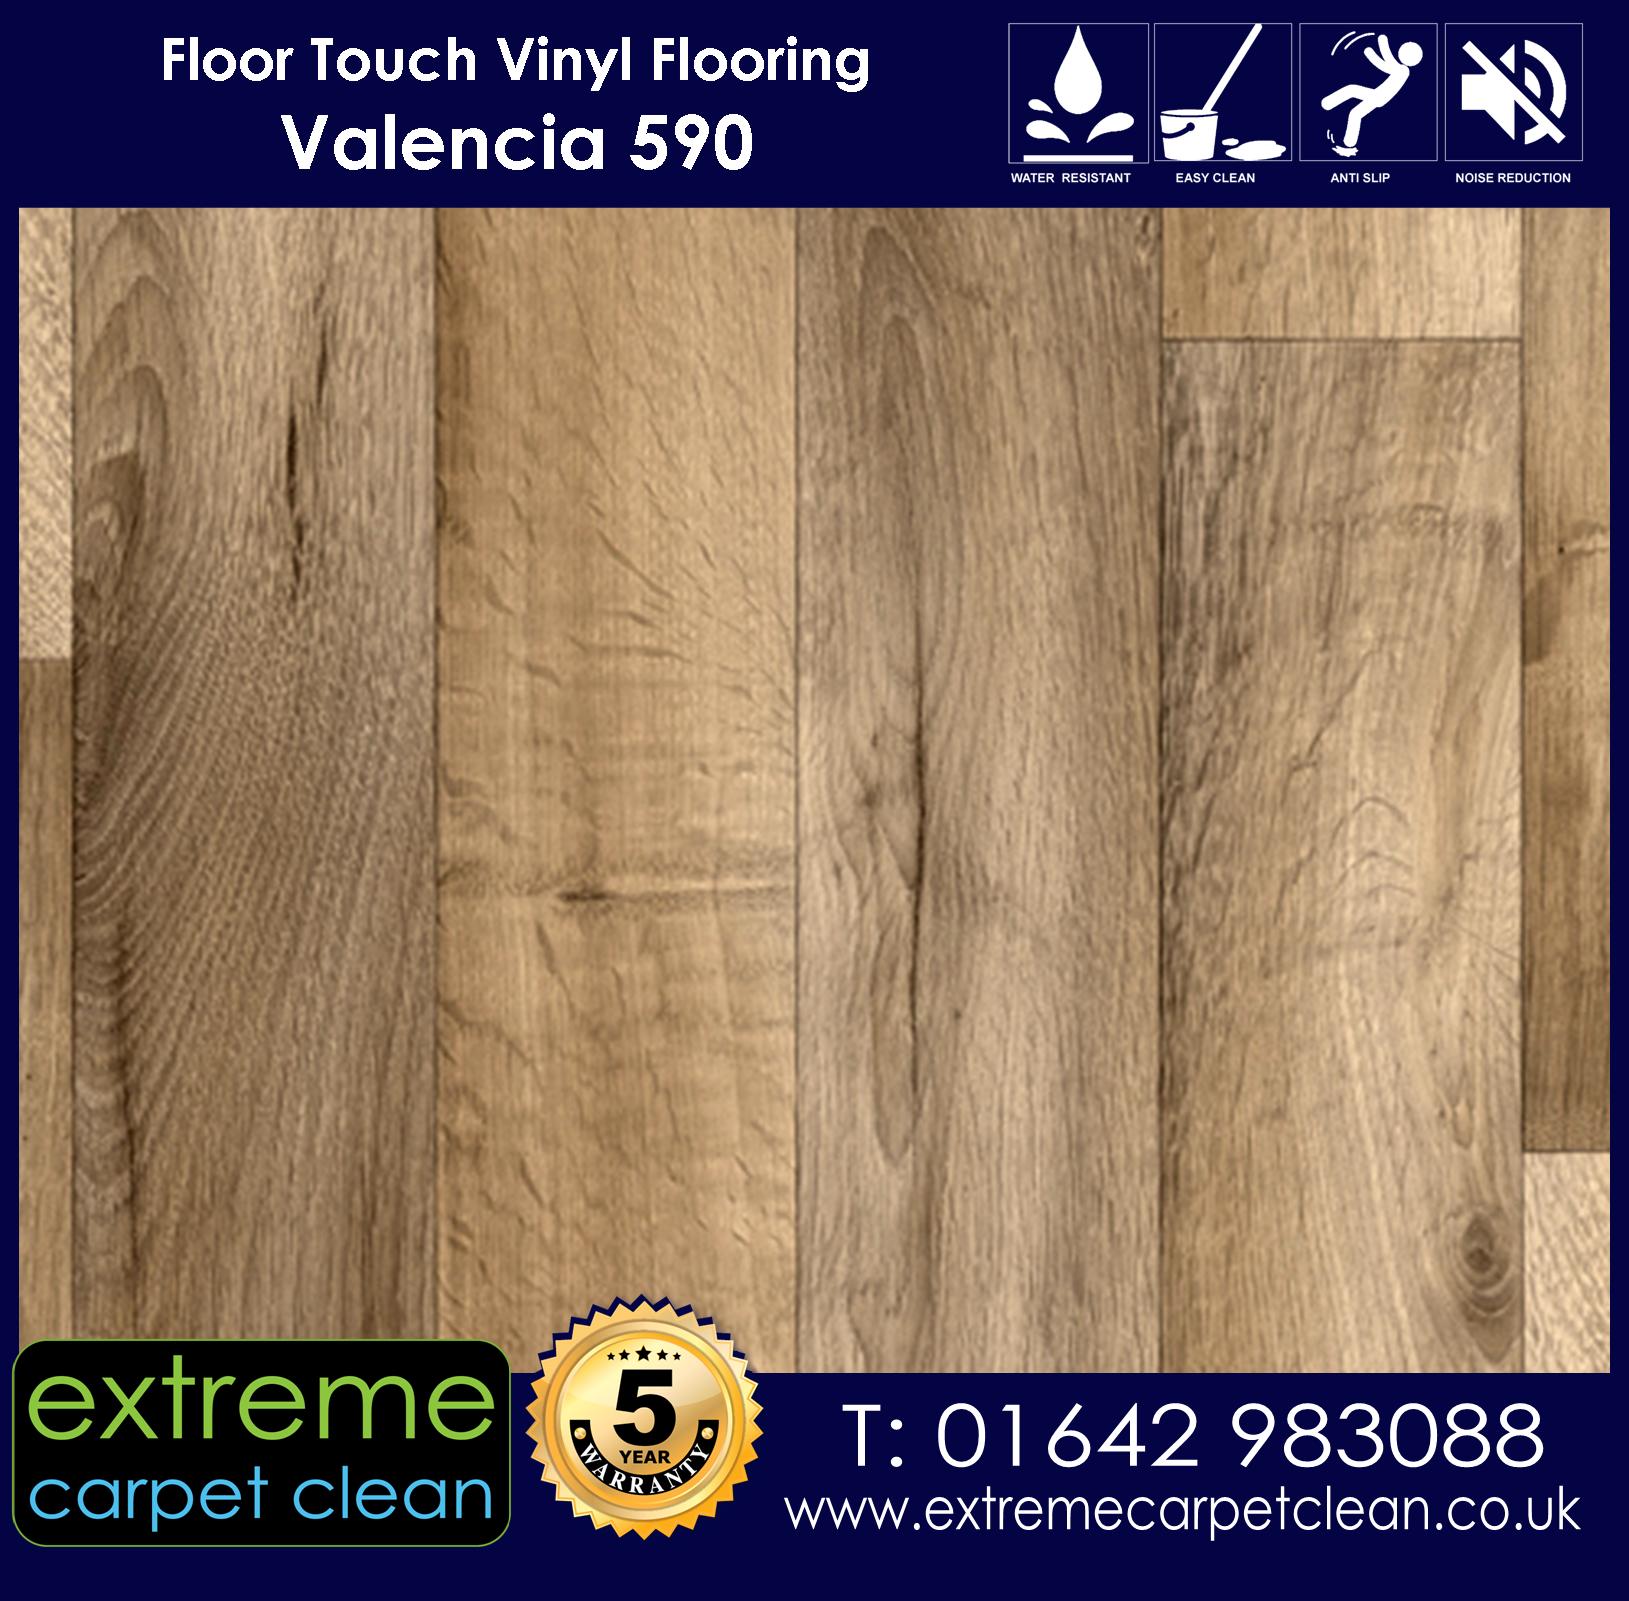 Extreme Carpet Clean Vinyl Flooring. Valencia 590